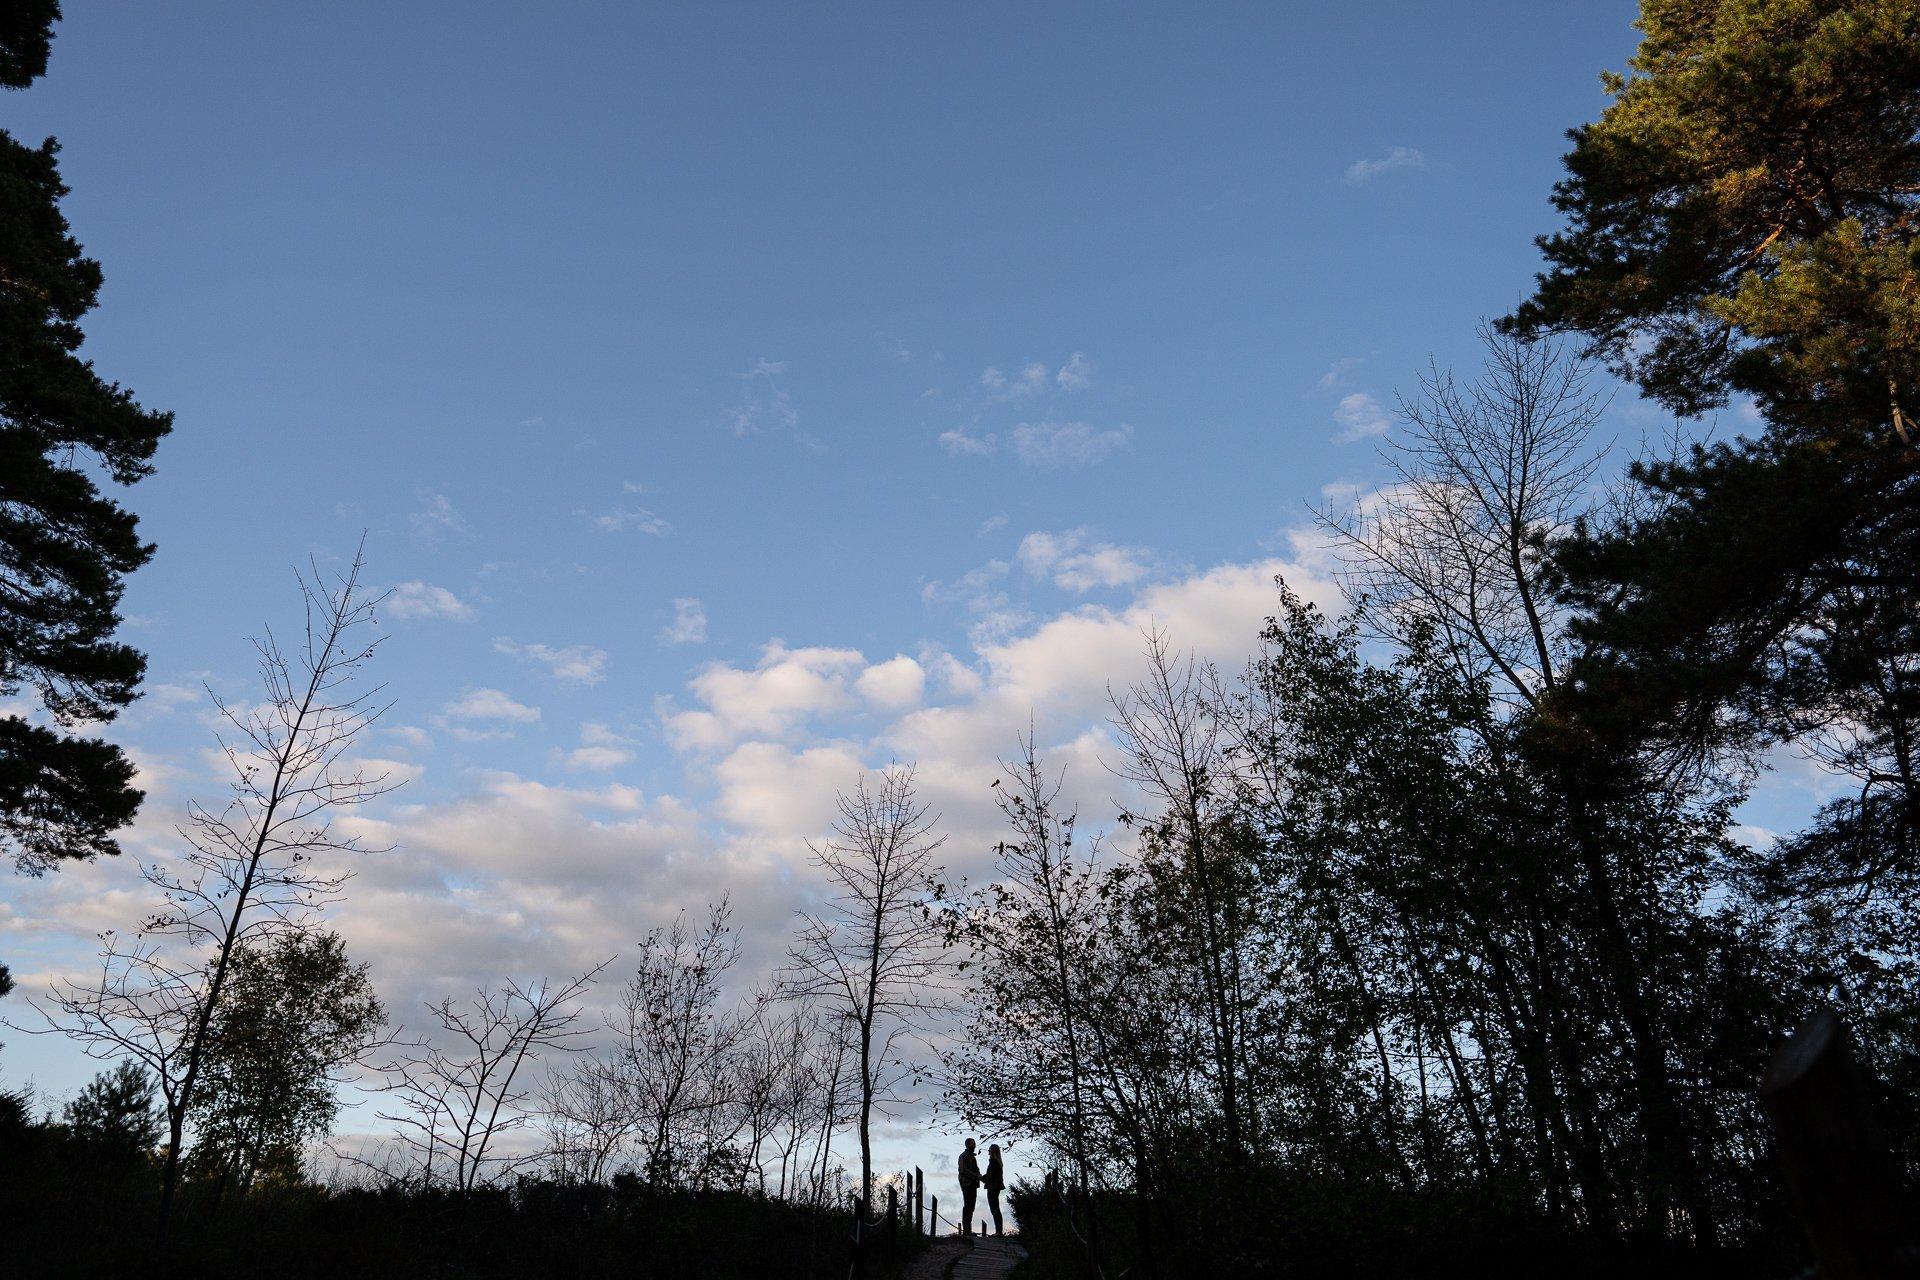 silhouette at Kohler-Andrae State Park